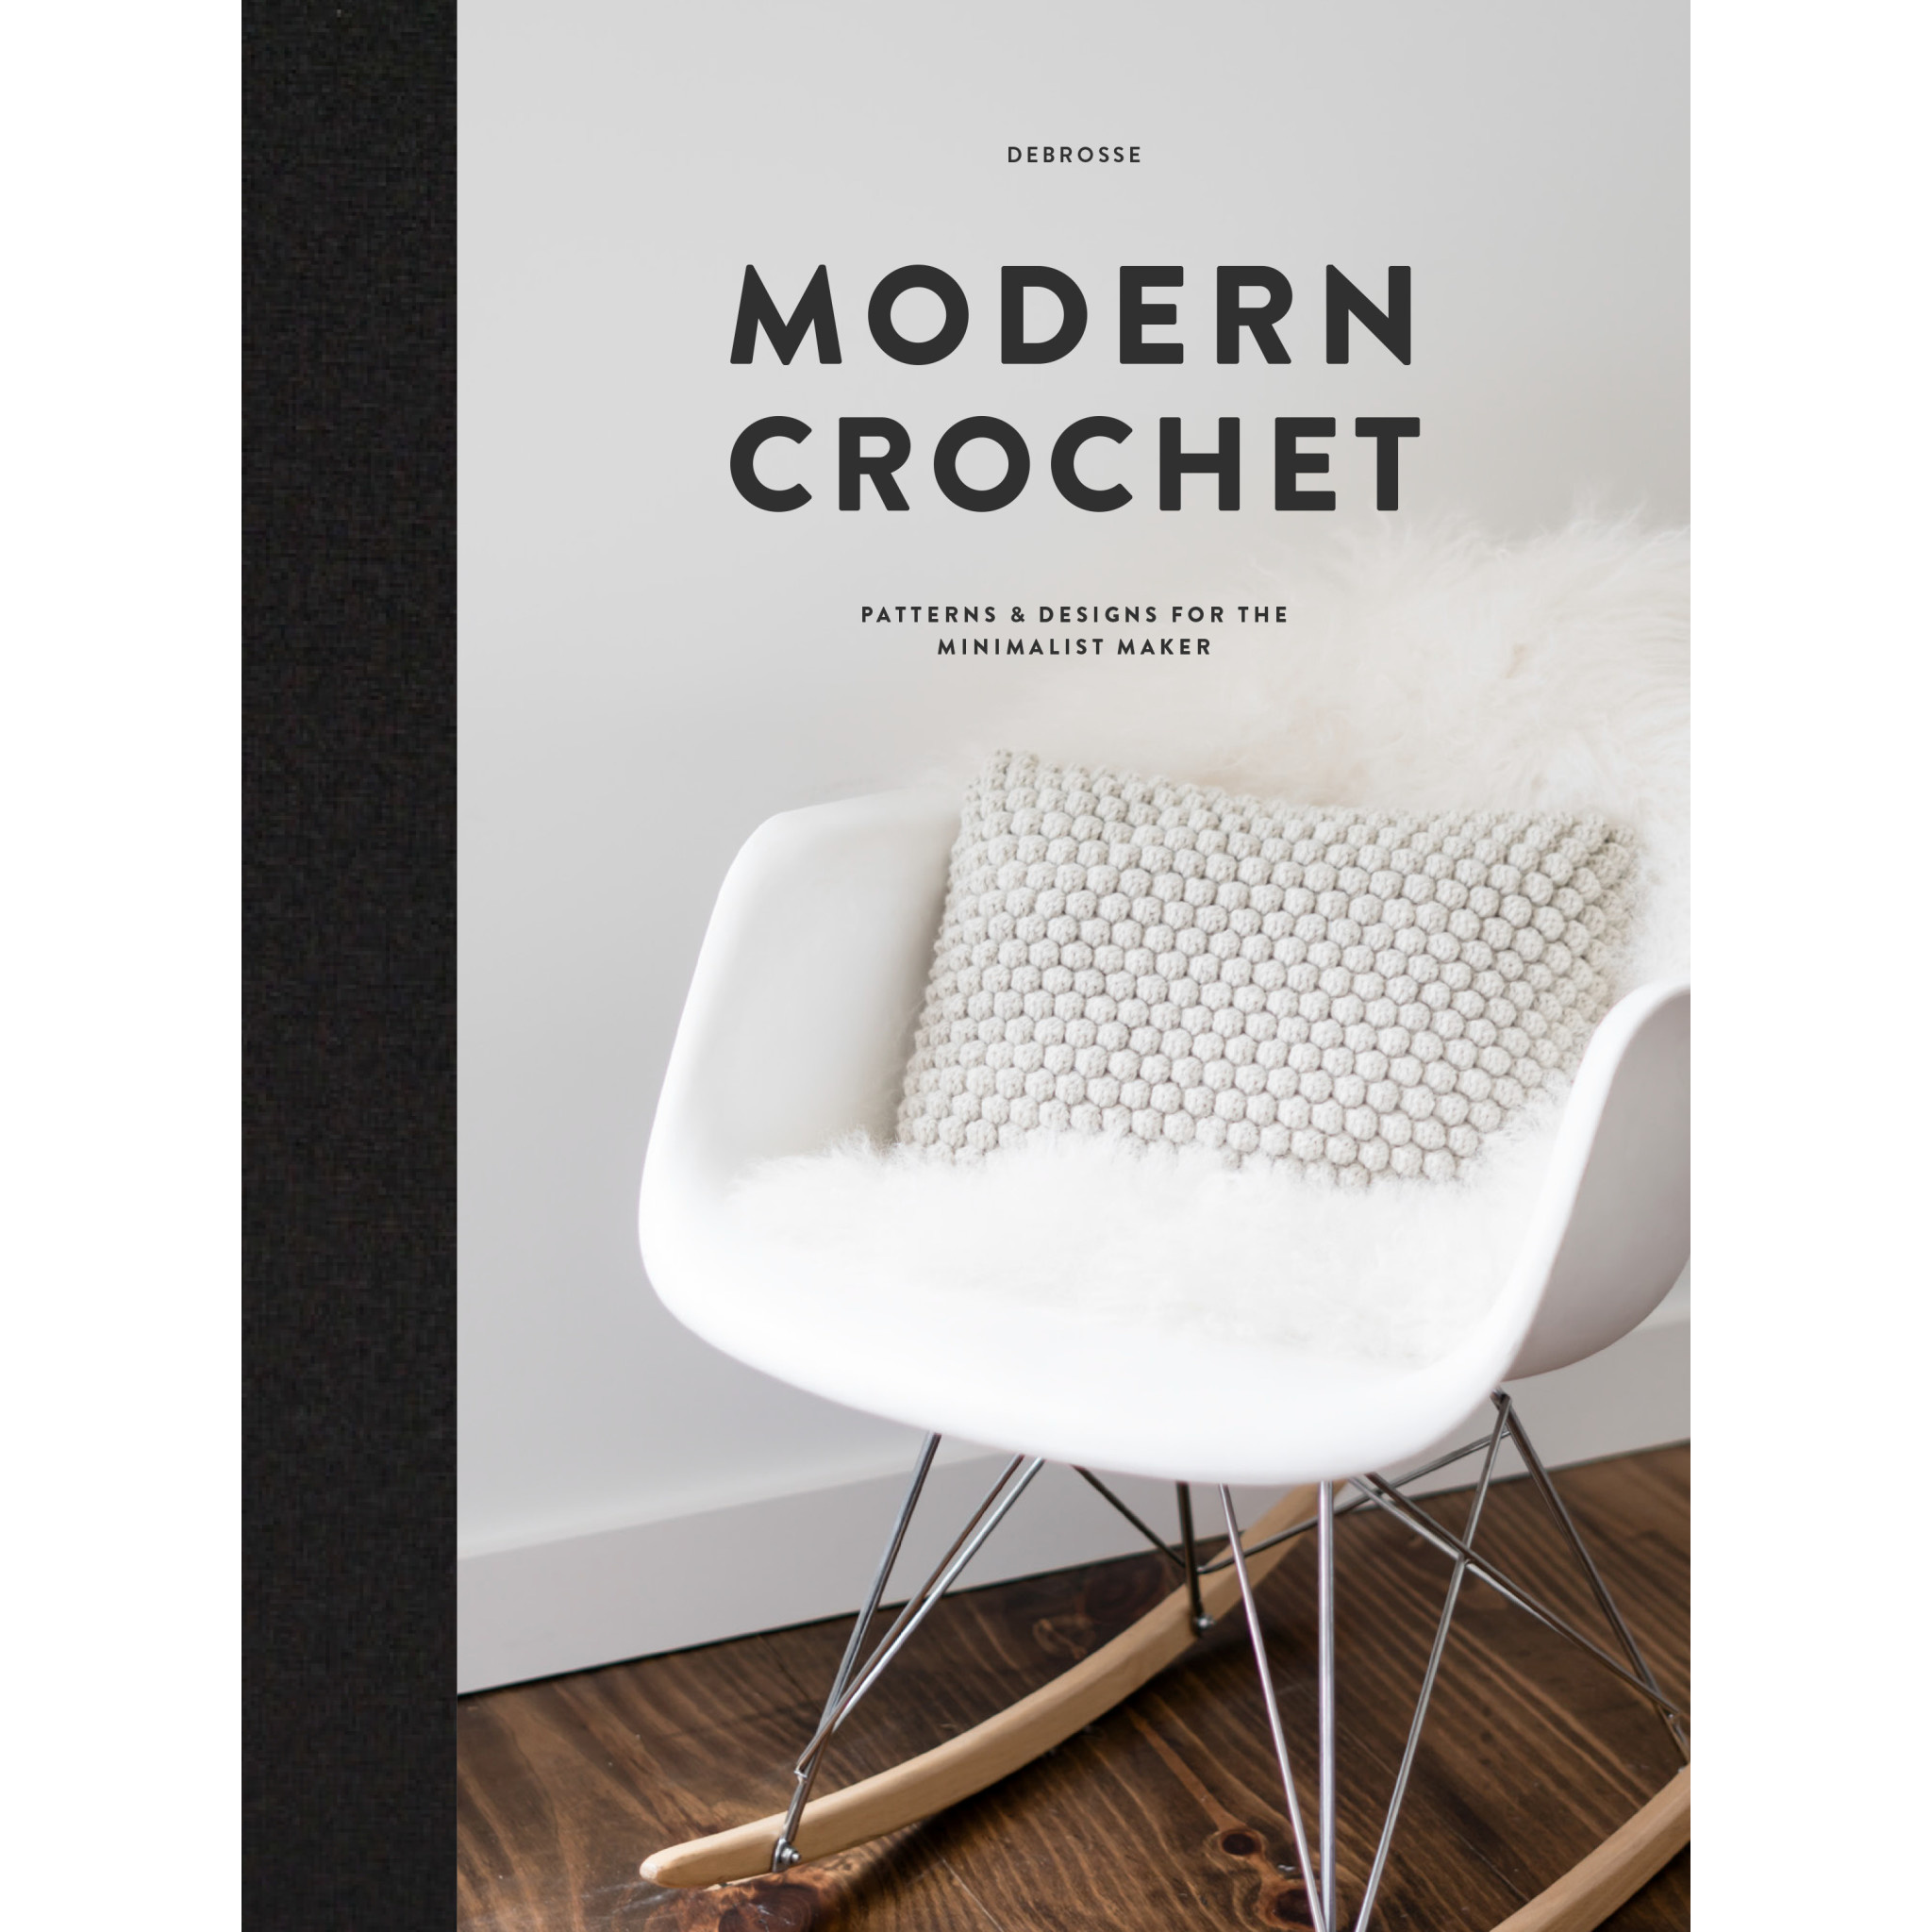 DEBROSSE MODERN CROCHET by TERESA CARTER